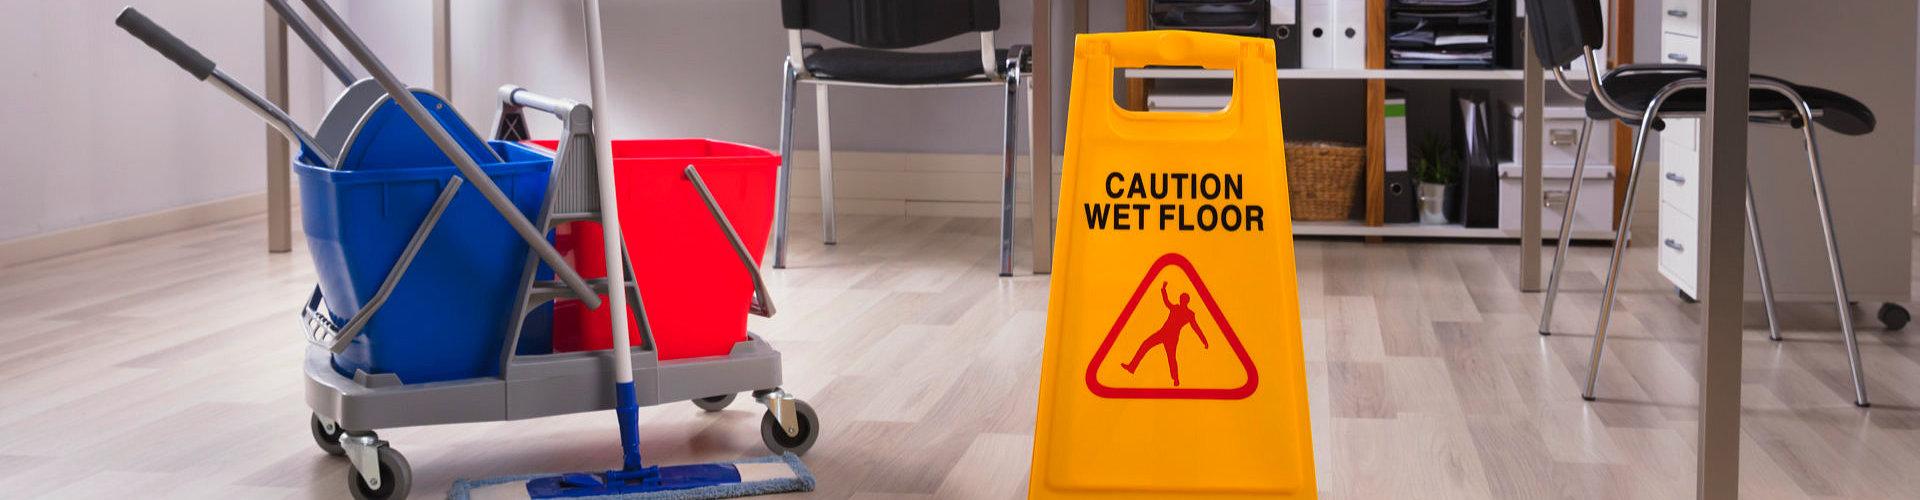 wet floor signage